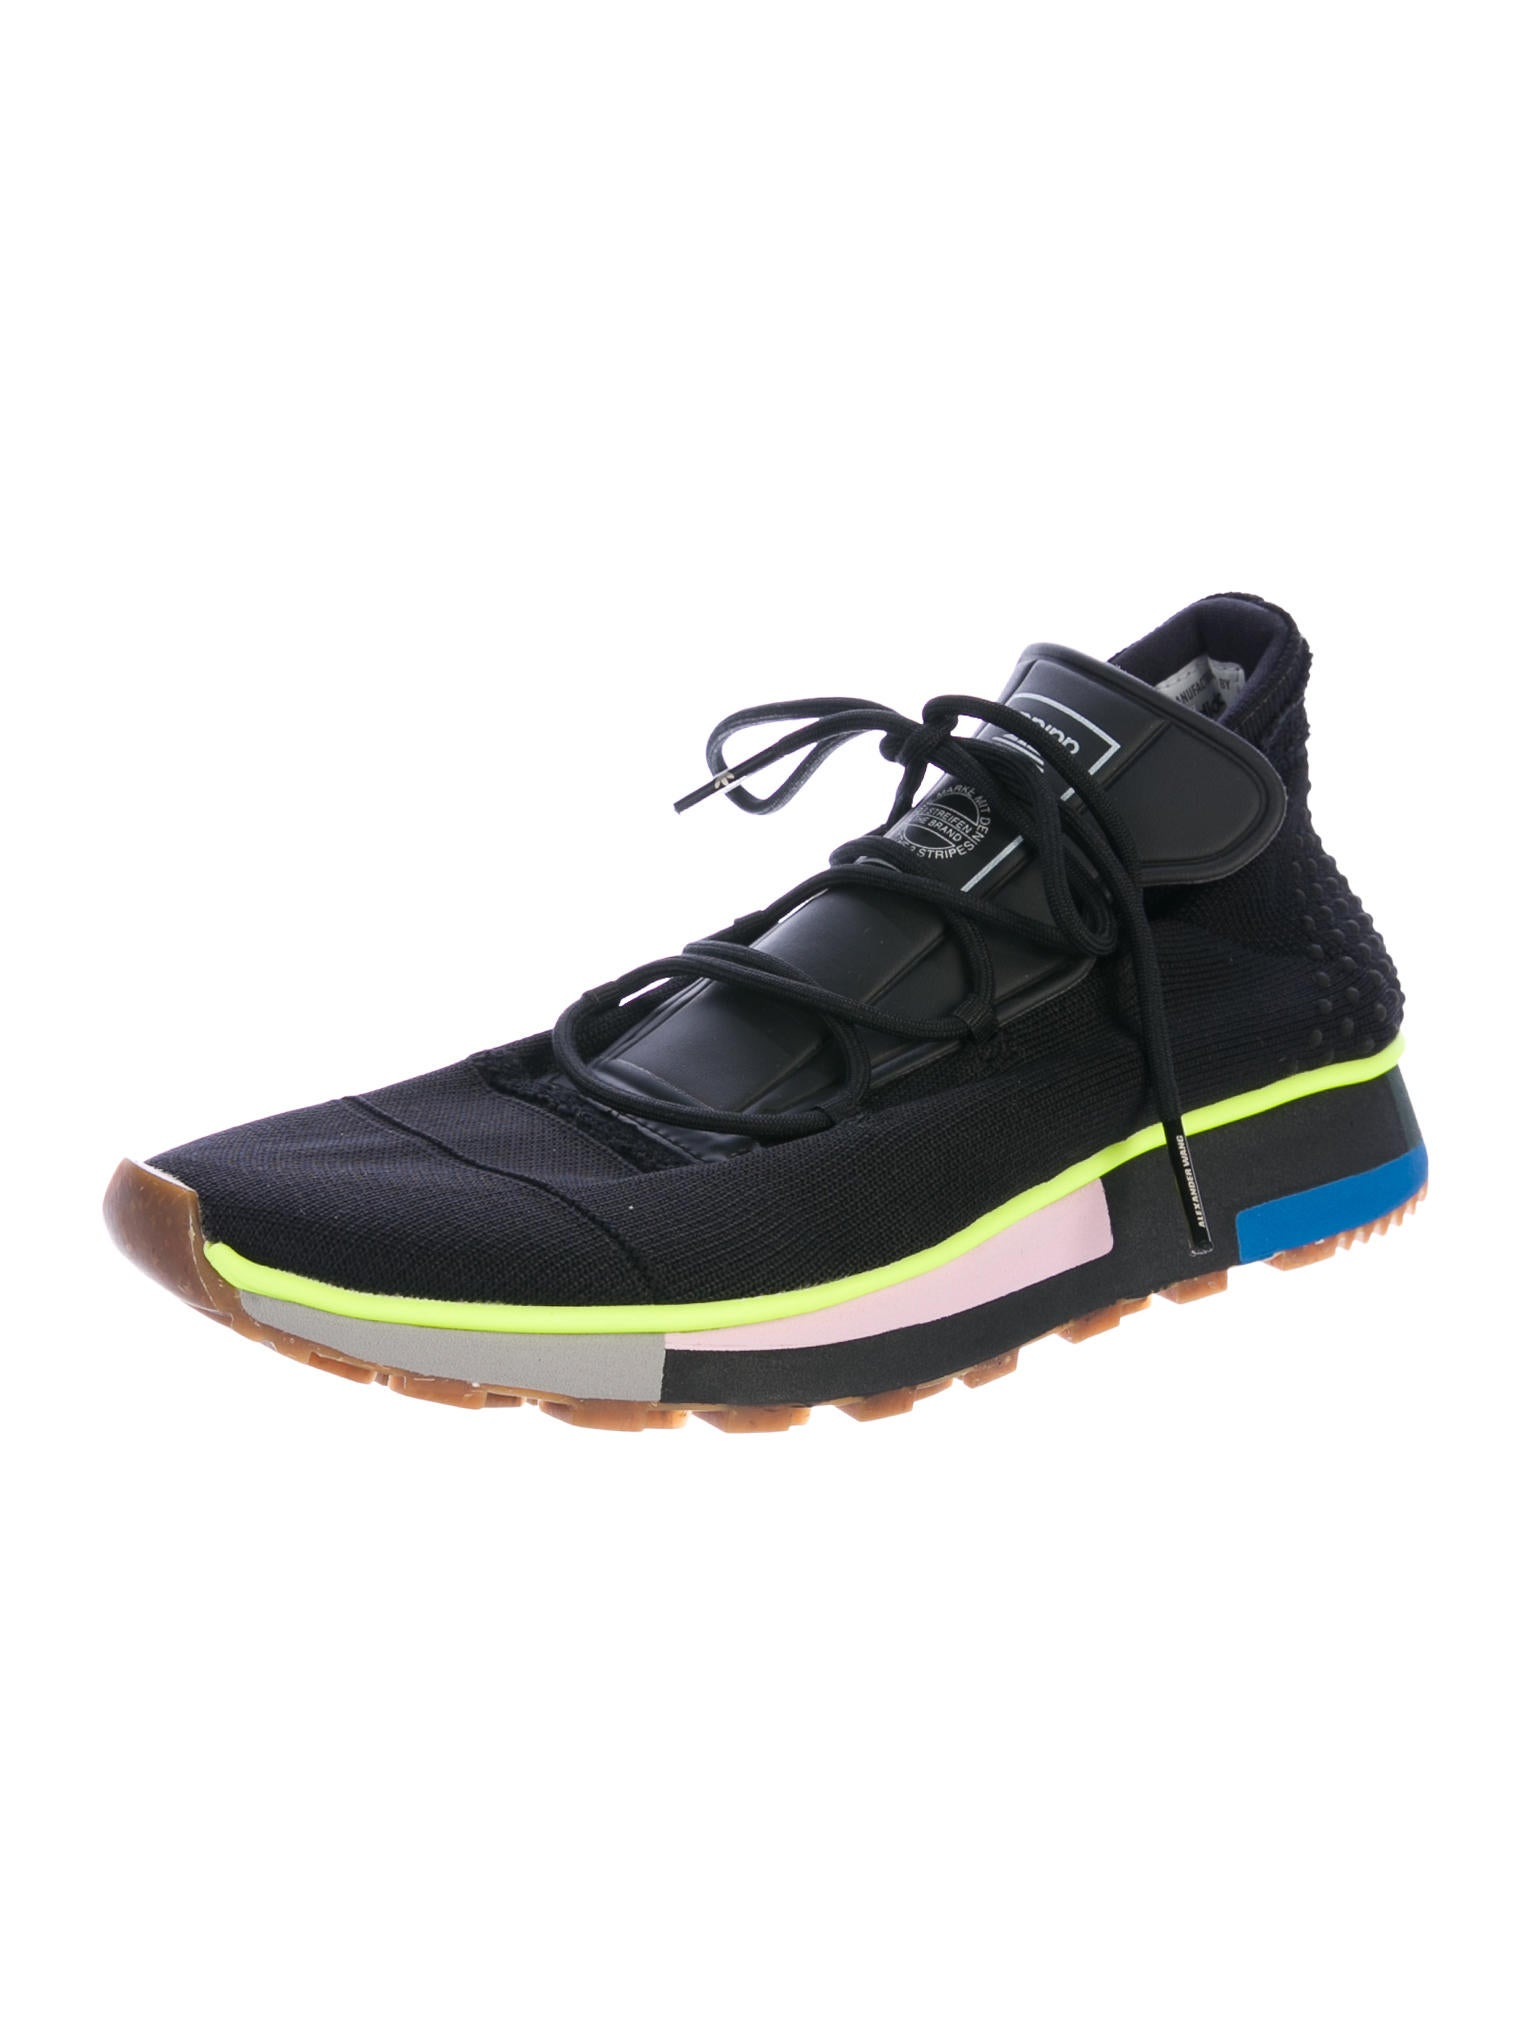 super popular 56018 a8d32 adidas Originals by Alexander Wang 2017 AW Run Mid Sneakers ...